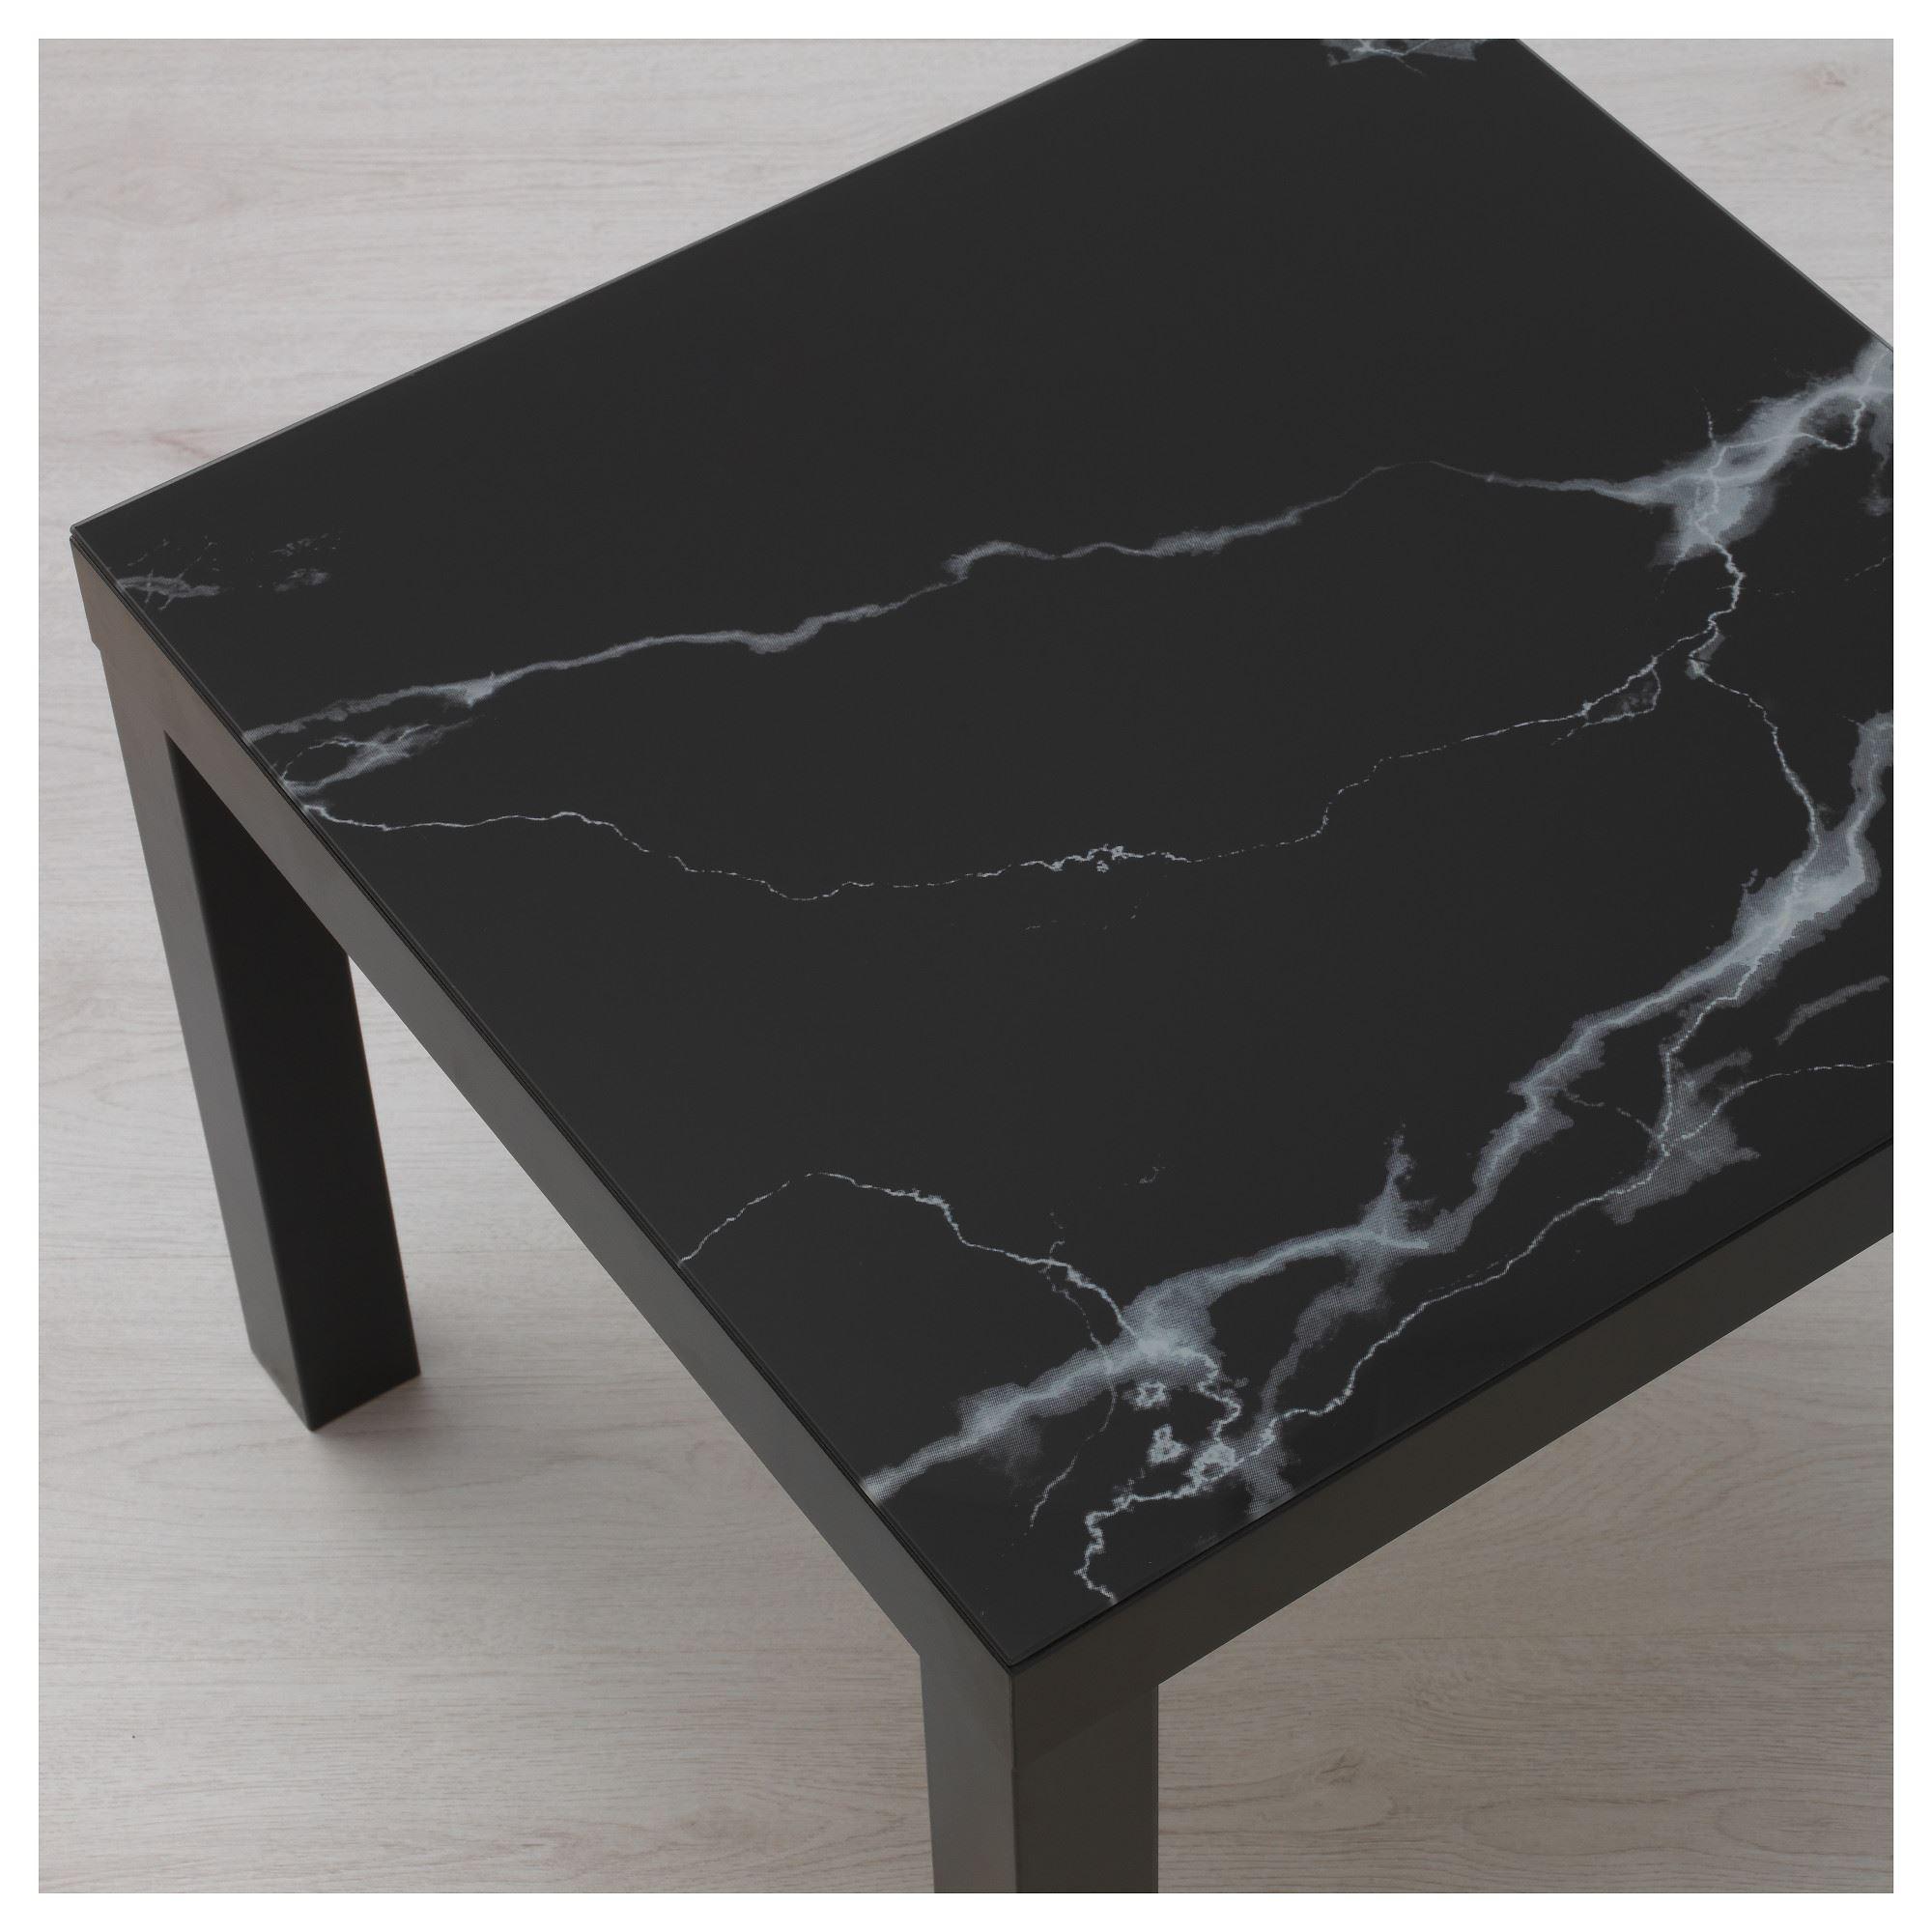 Lack Ust Cam Siyah Mermer Gorunumlu 55x55 Cm Ikea Oturma Odalari